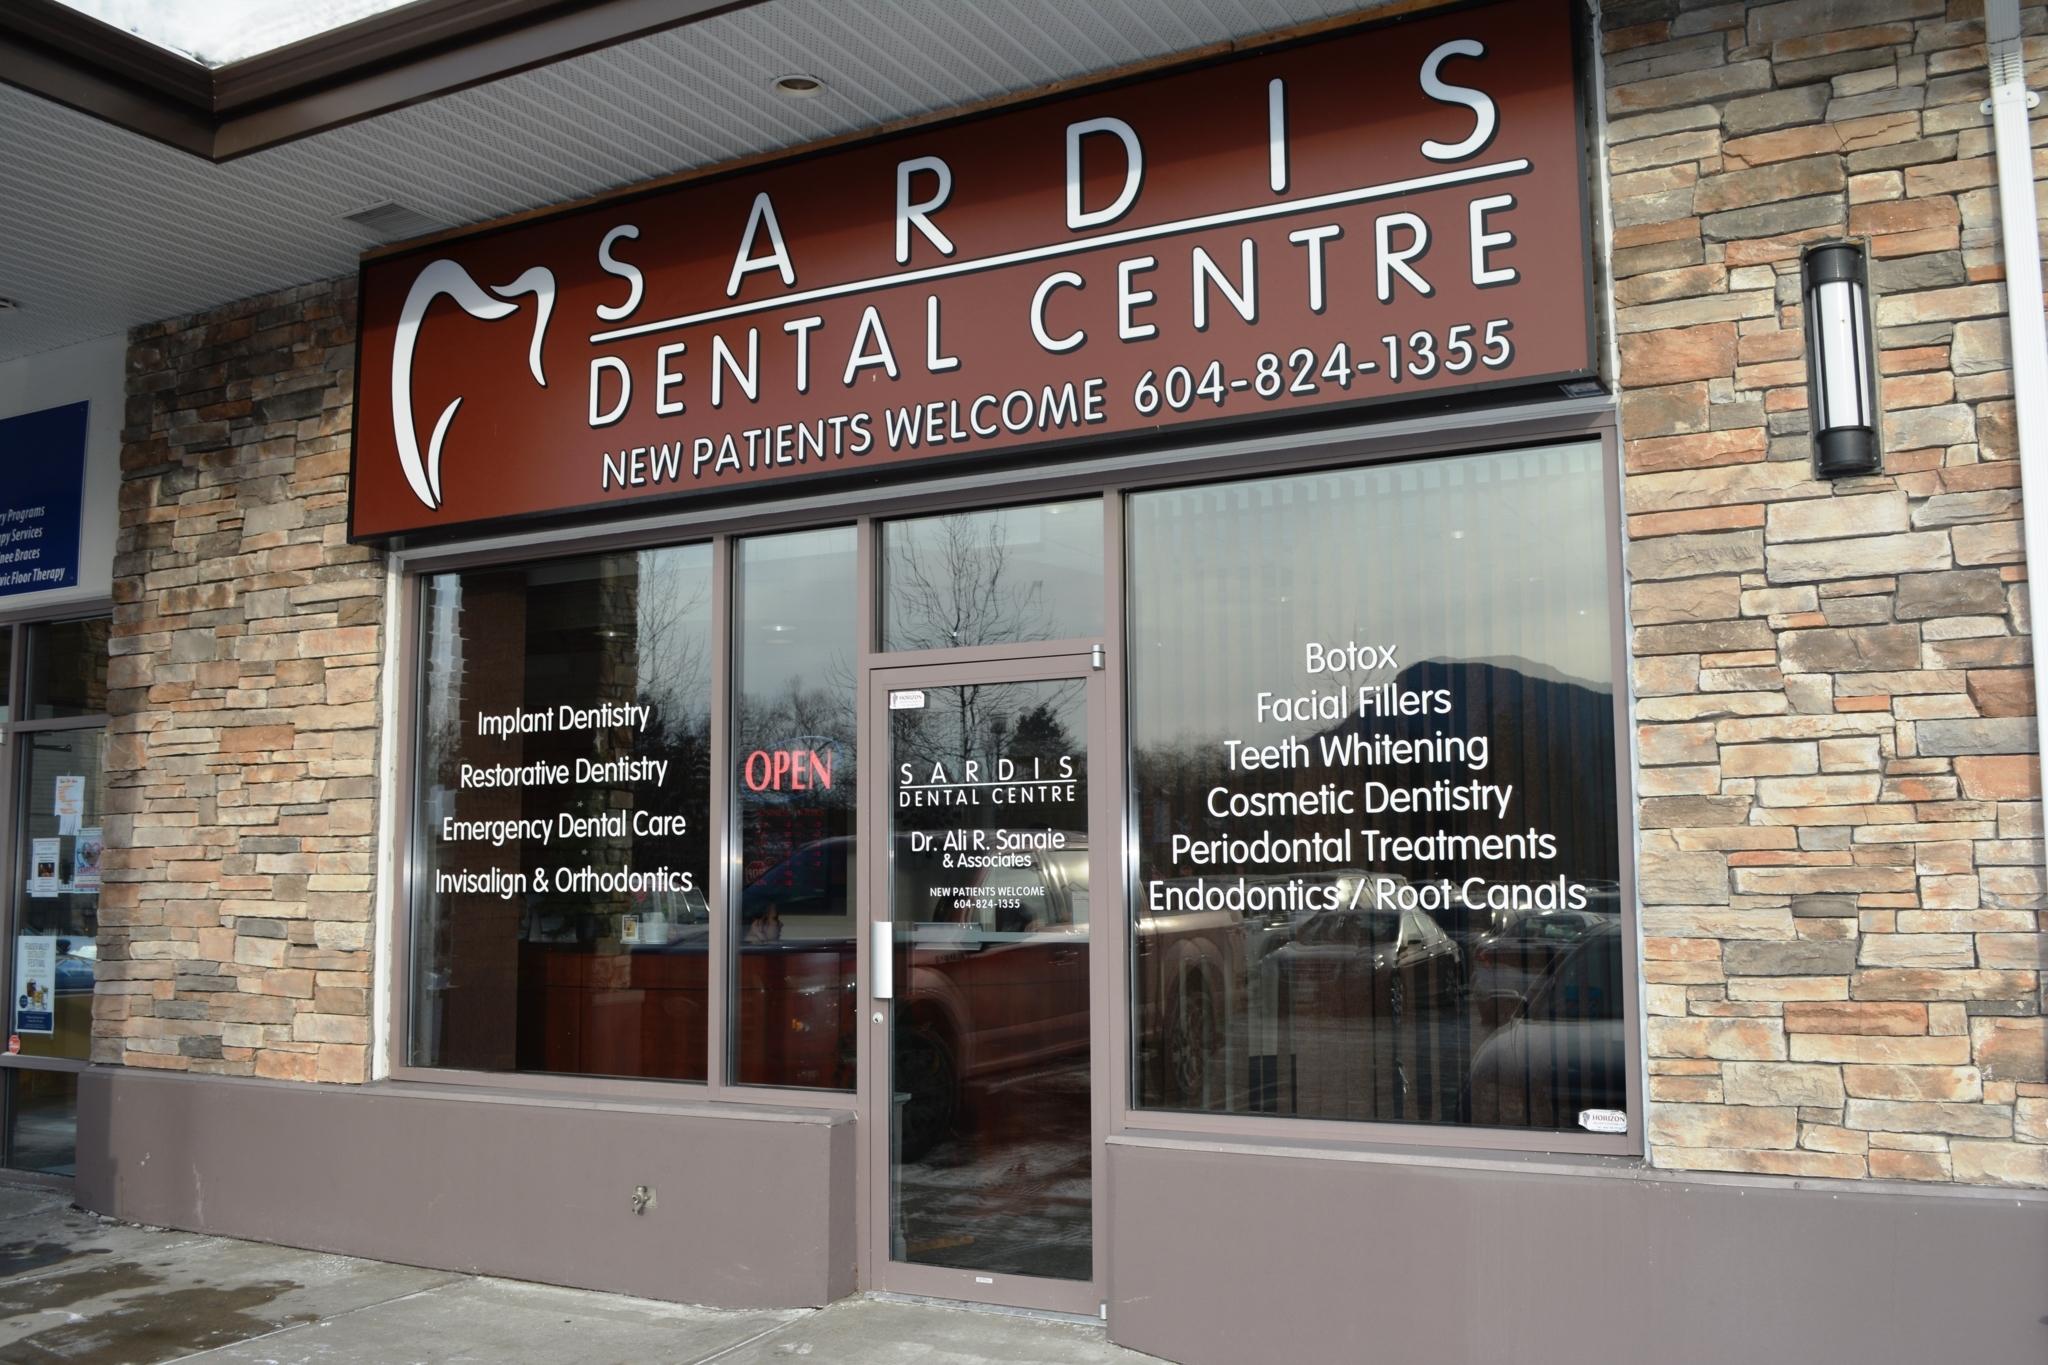 Sardis Dental Centre